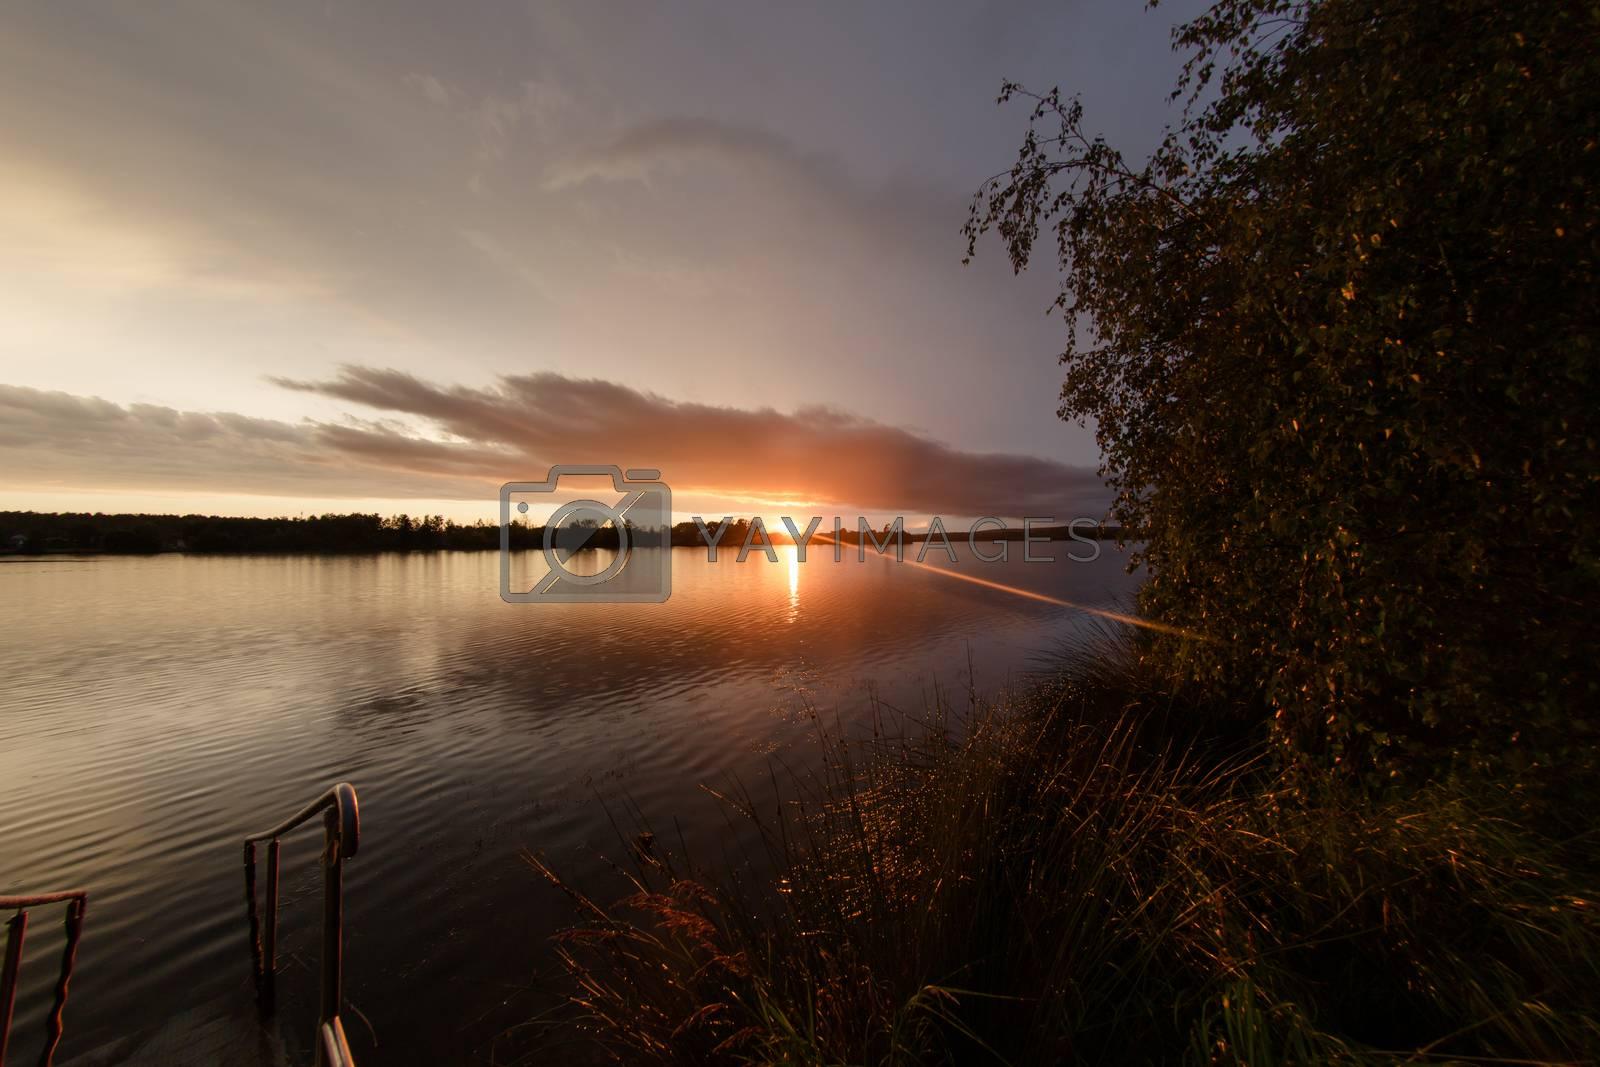 Landscape at the Murner lake, Wackersdorf, Bavaria by Sandra Fotodesign